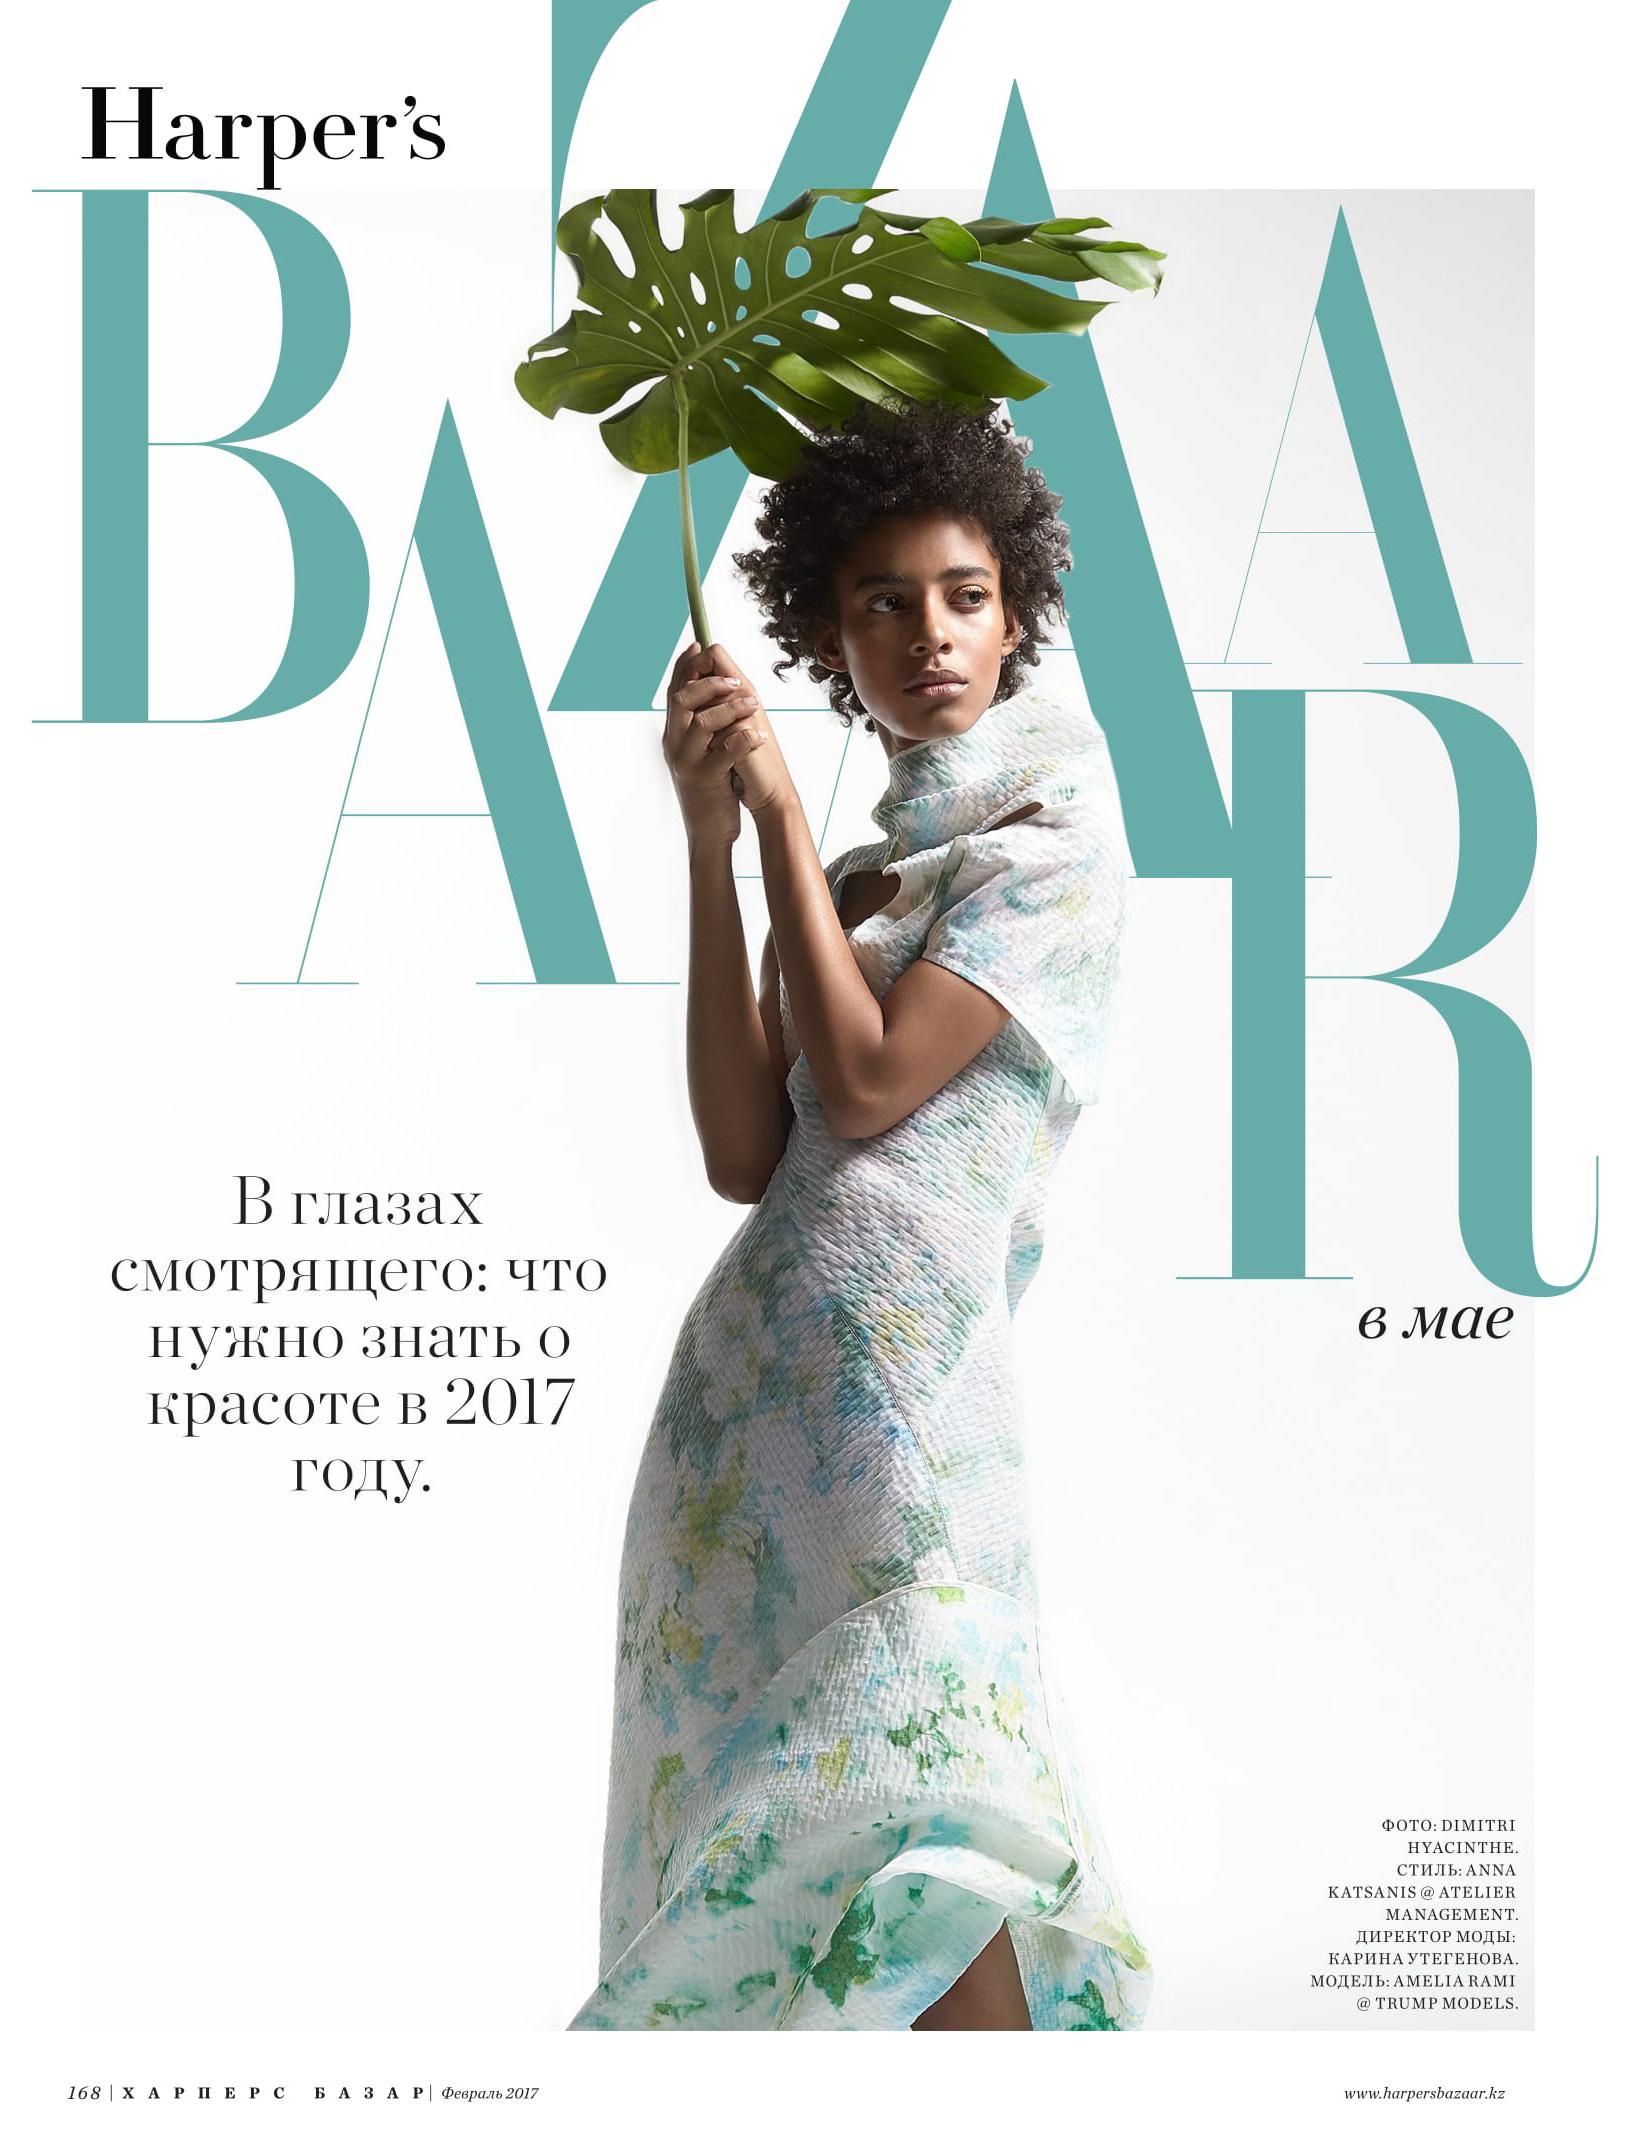 HBKZ may2017 cover w.jpg